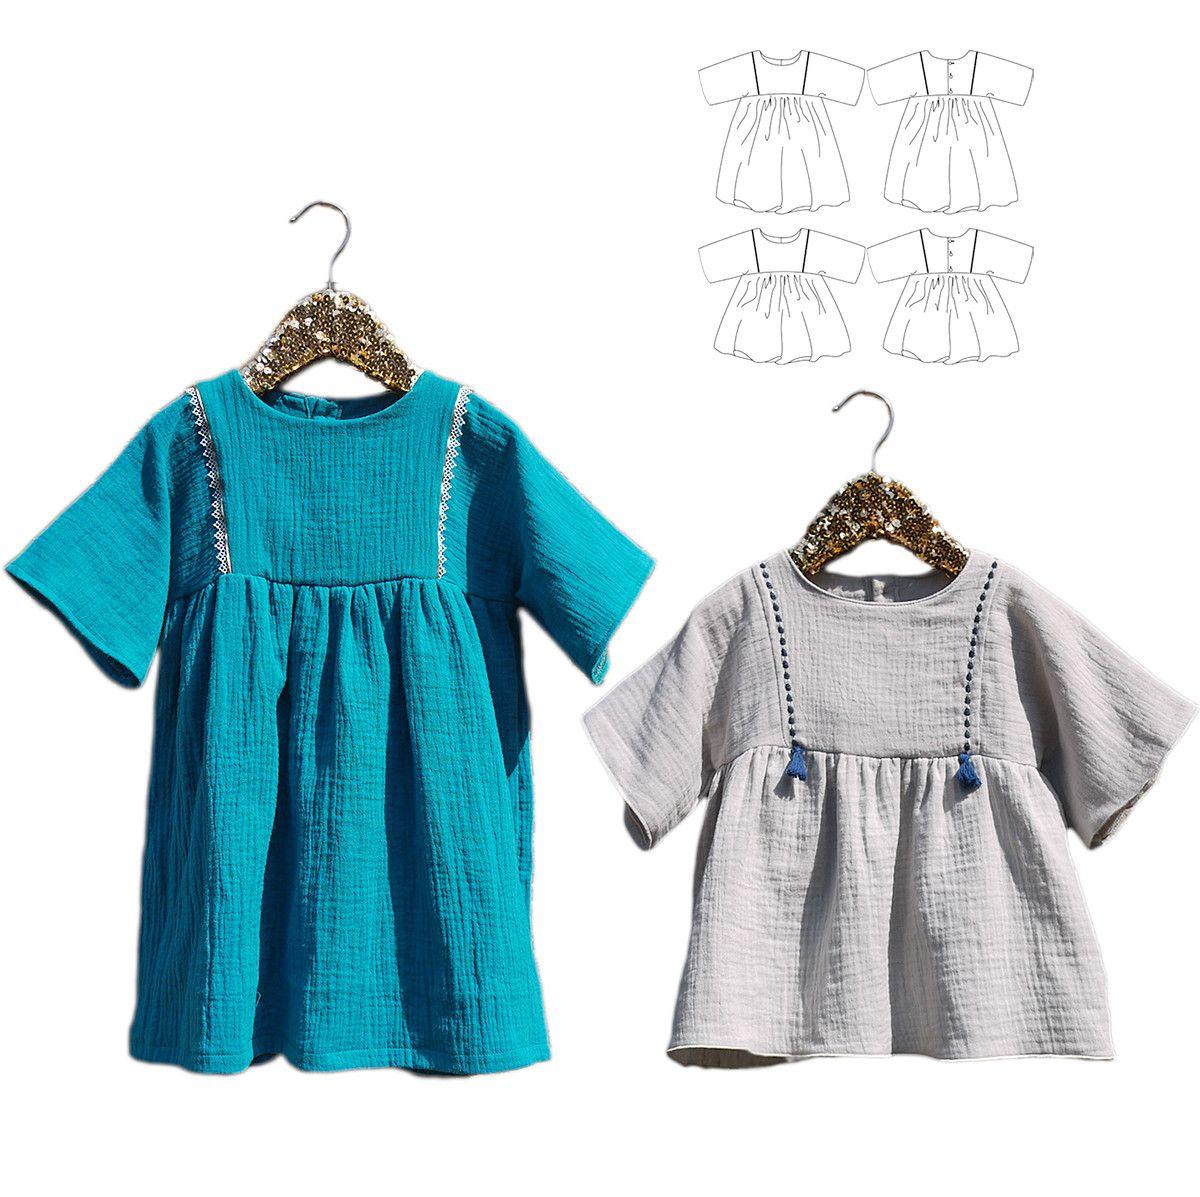 DUO Blouse + Robe Fille SAKURA PDF 3-12A | Puppenkleidung ...